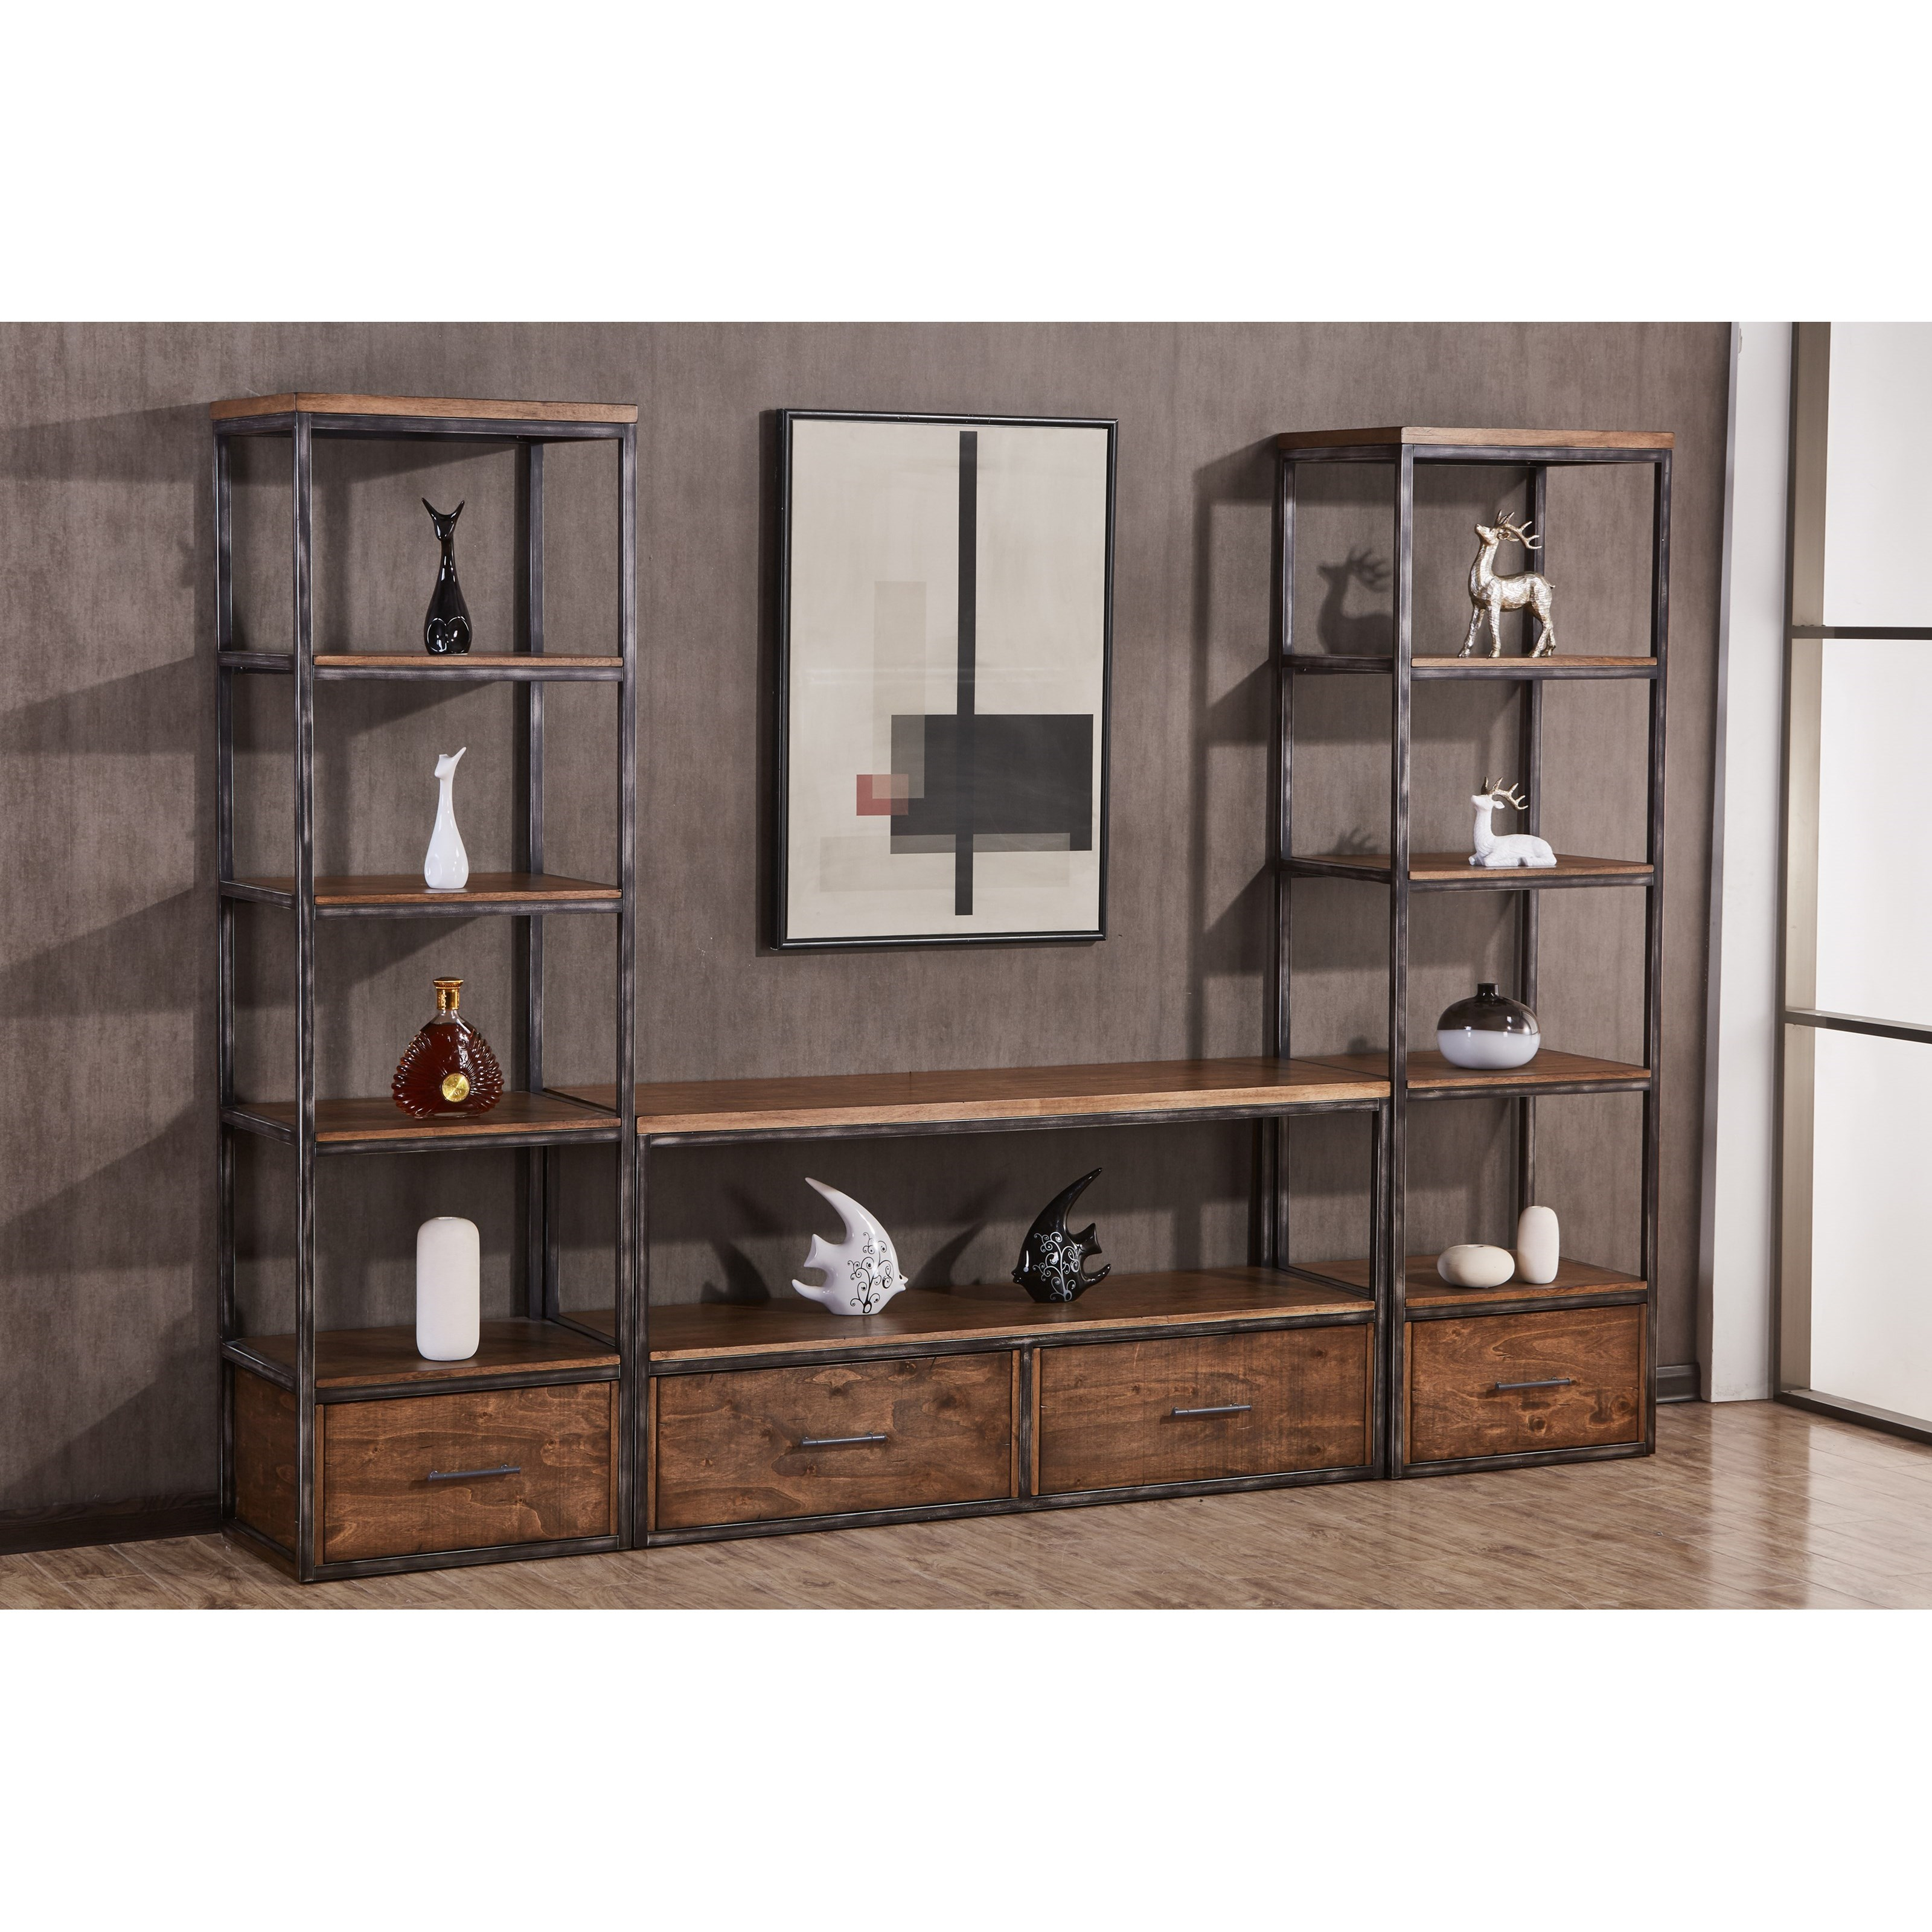 7326 Wall Unit by United Furniture Industries at Bullard Furniture